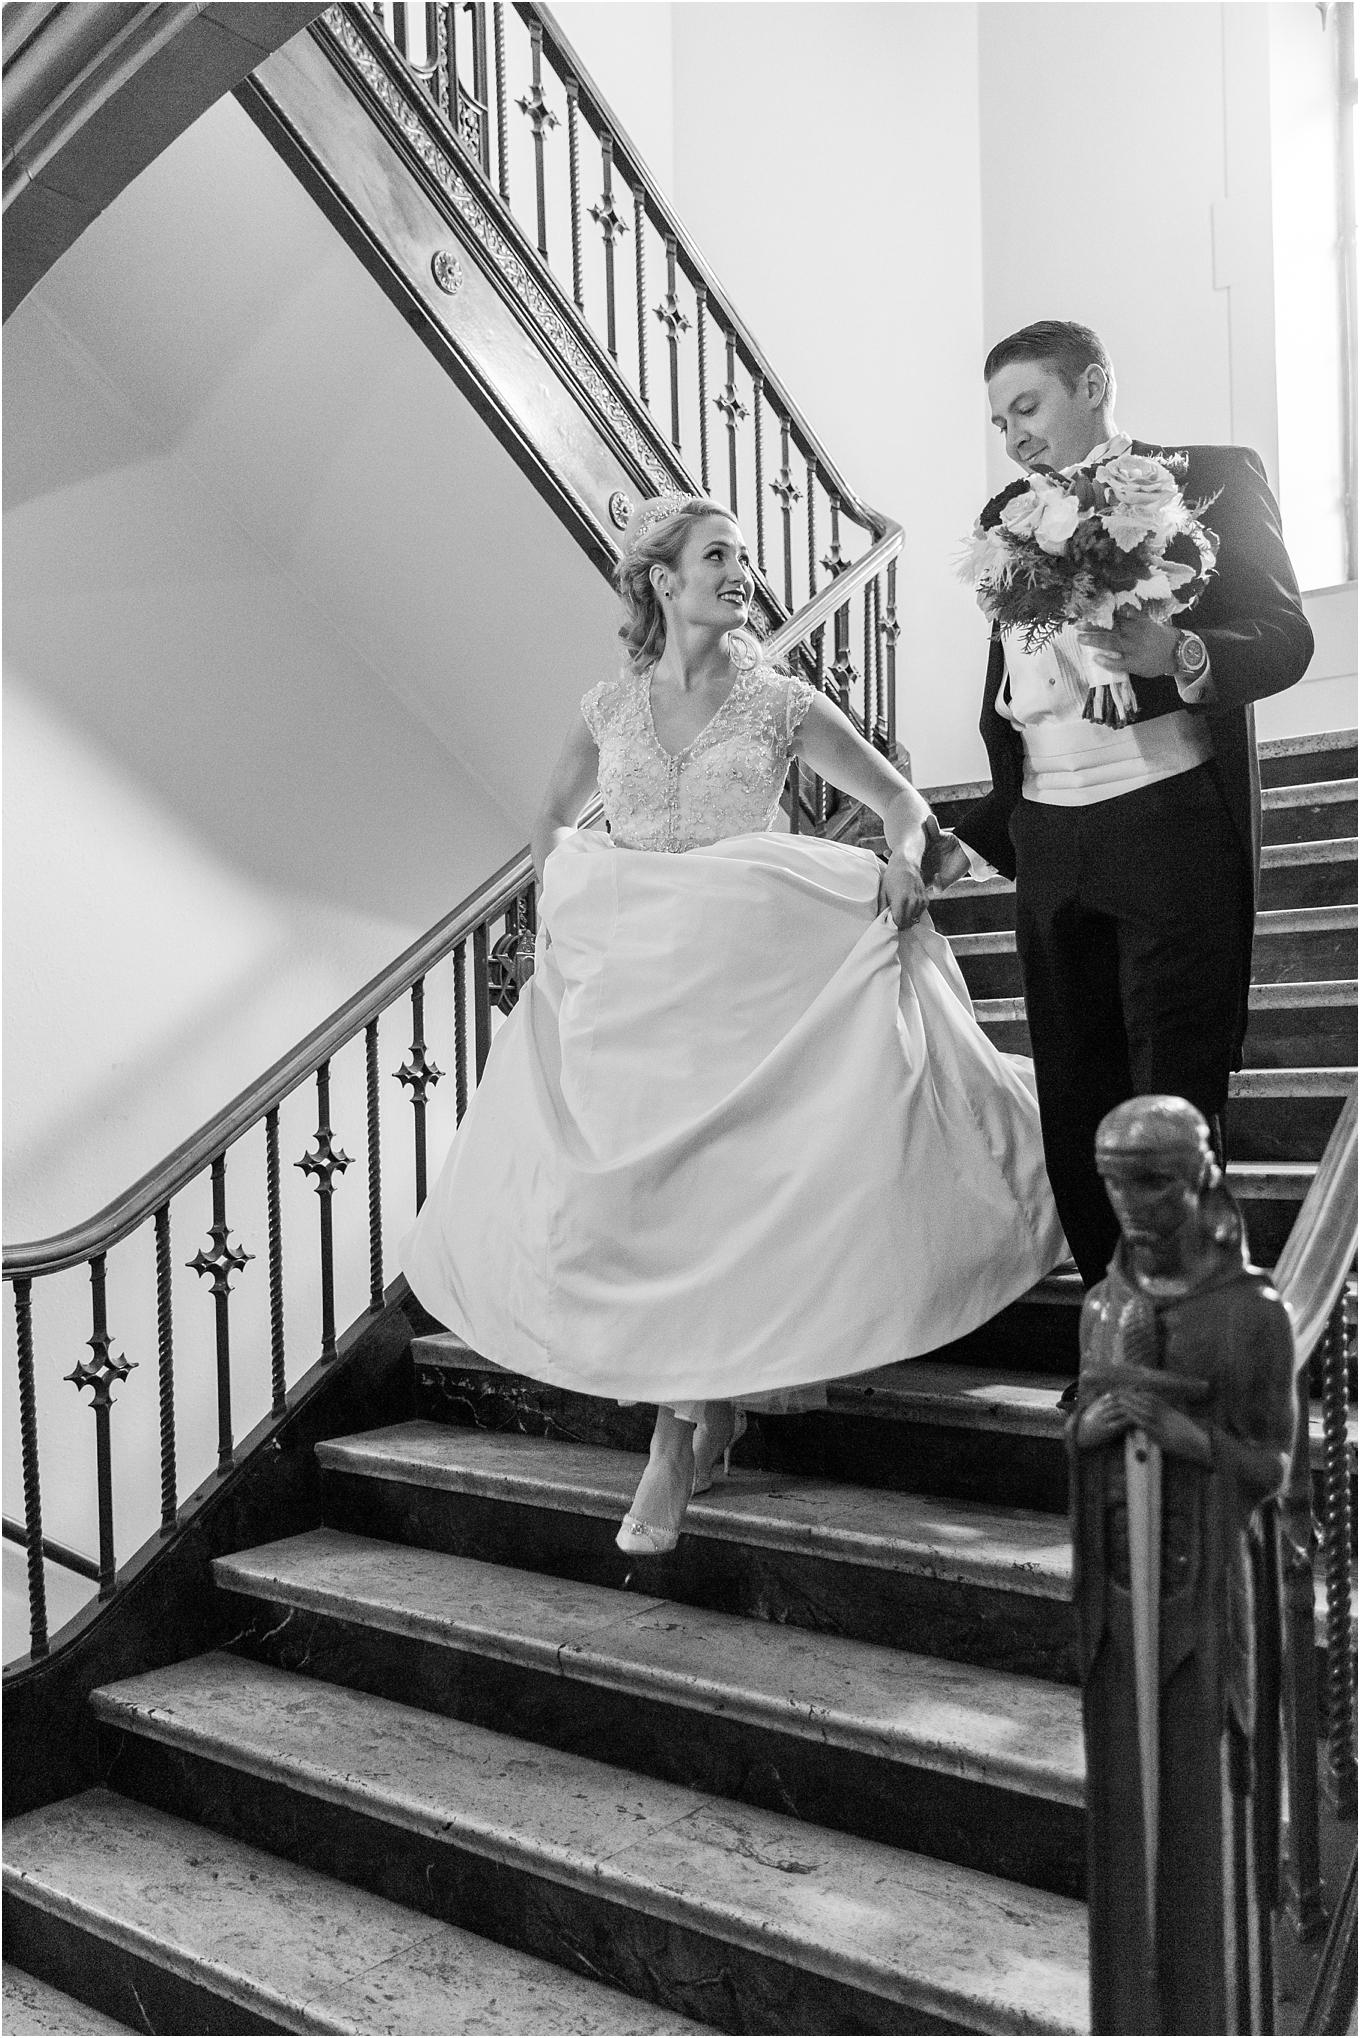 elegant-classic-fairytale-wedding-photos-in-detroit-mi-at-the-masonic-temple-by-courtney-carolyn-photography_0053.jpg